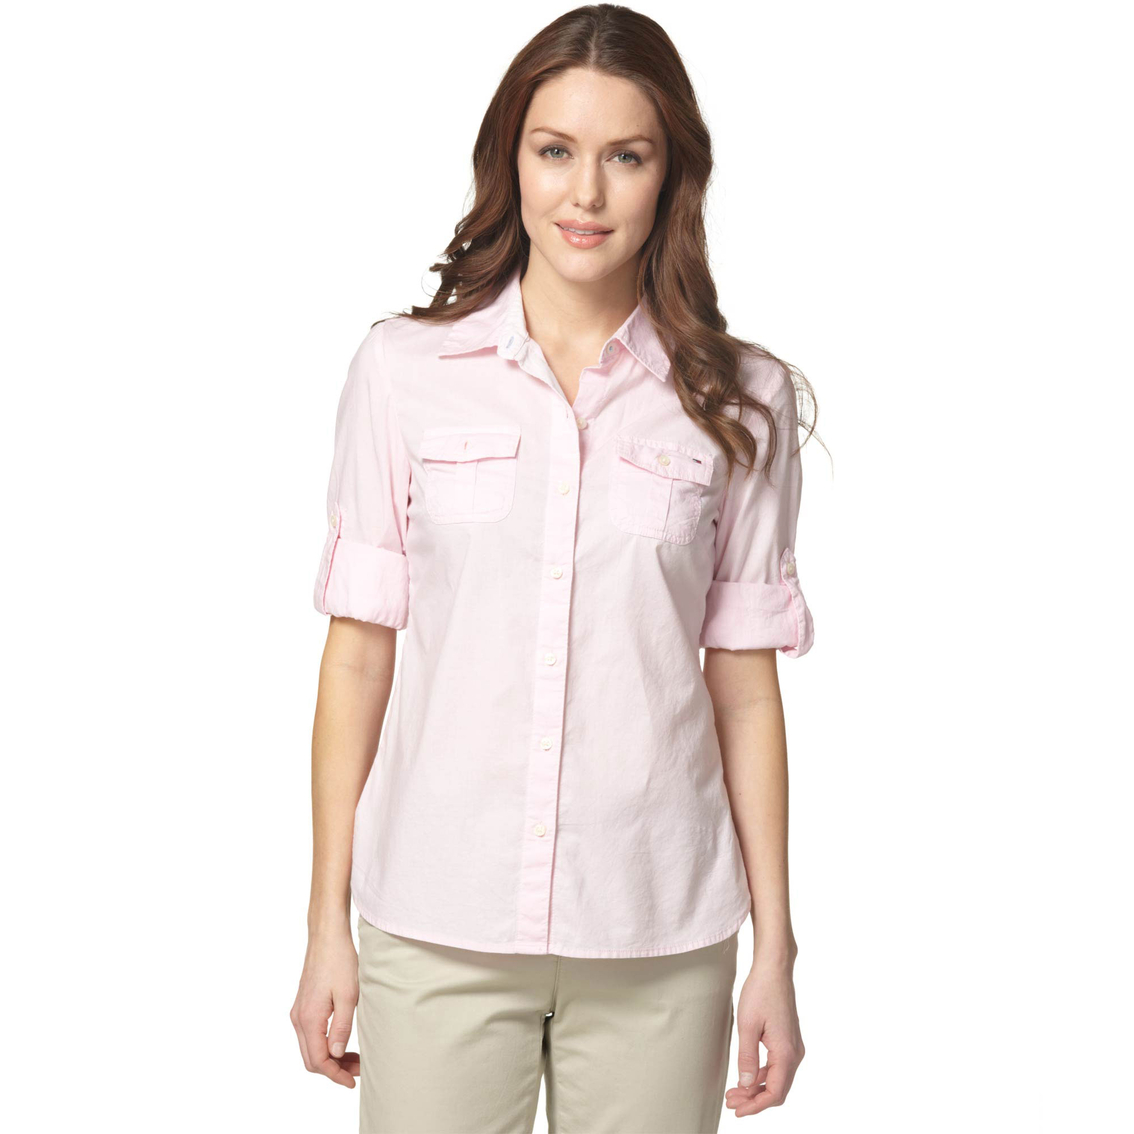 Tommy Hilfiger Solid Roll Tab Shirt Casual Shirts Apparel Shop